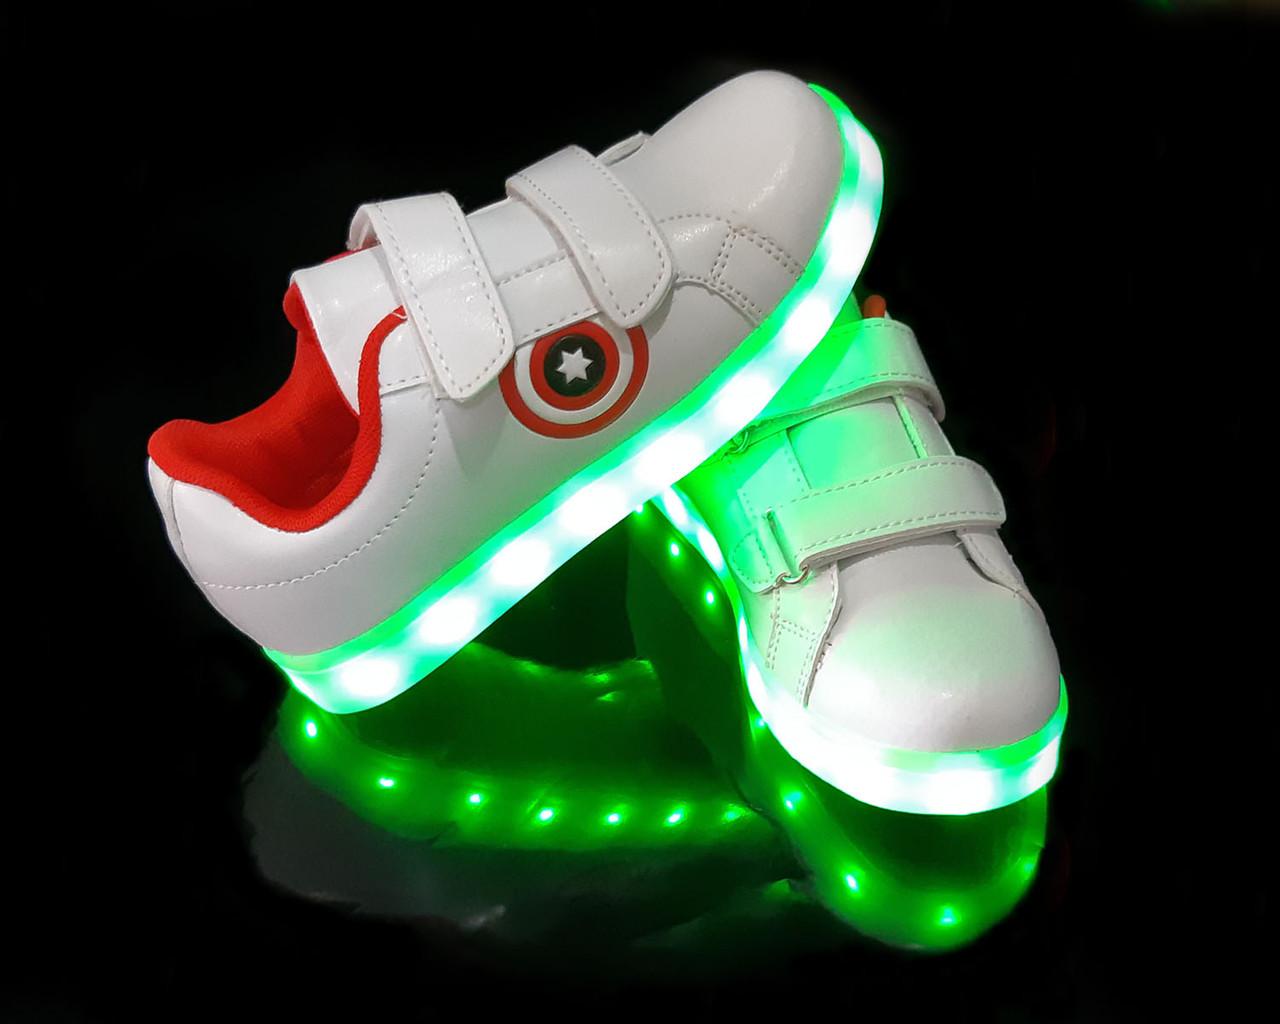 Кроссовки с LED подсветкой детские White 702